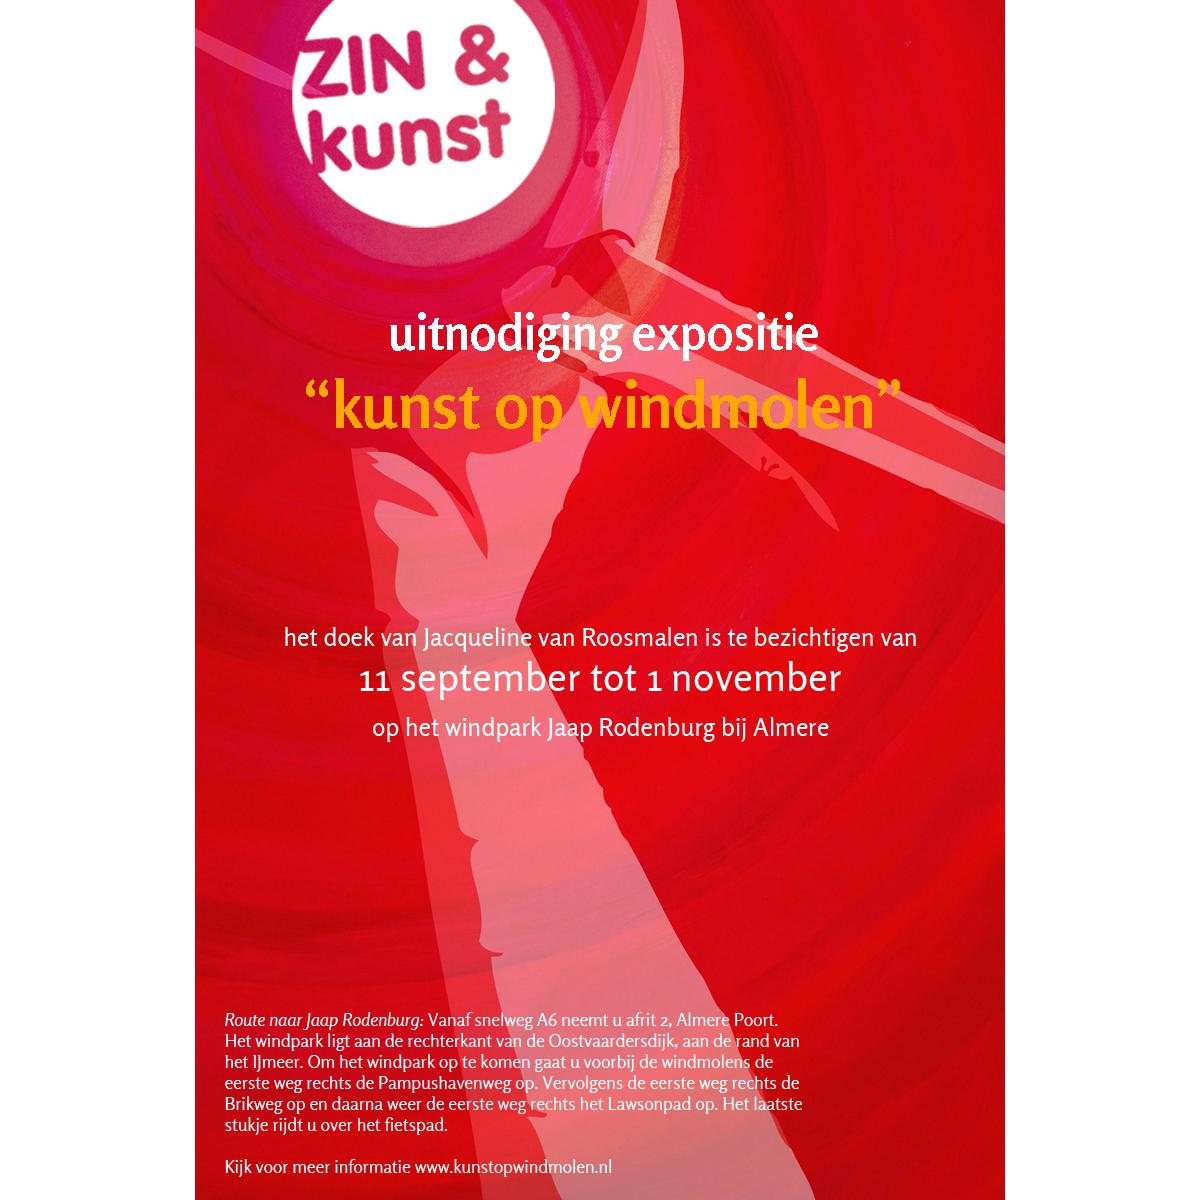 uitnodiging kunstopwindmolen 2012.jpg